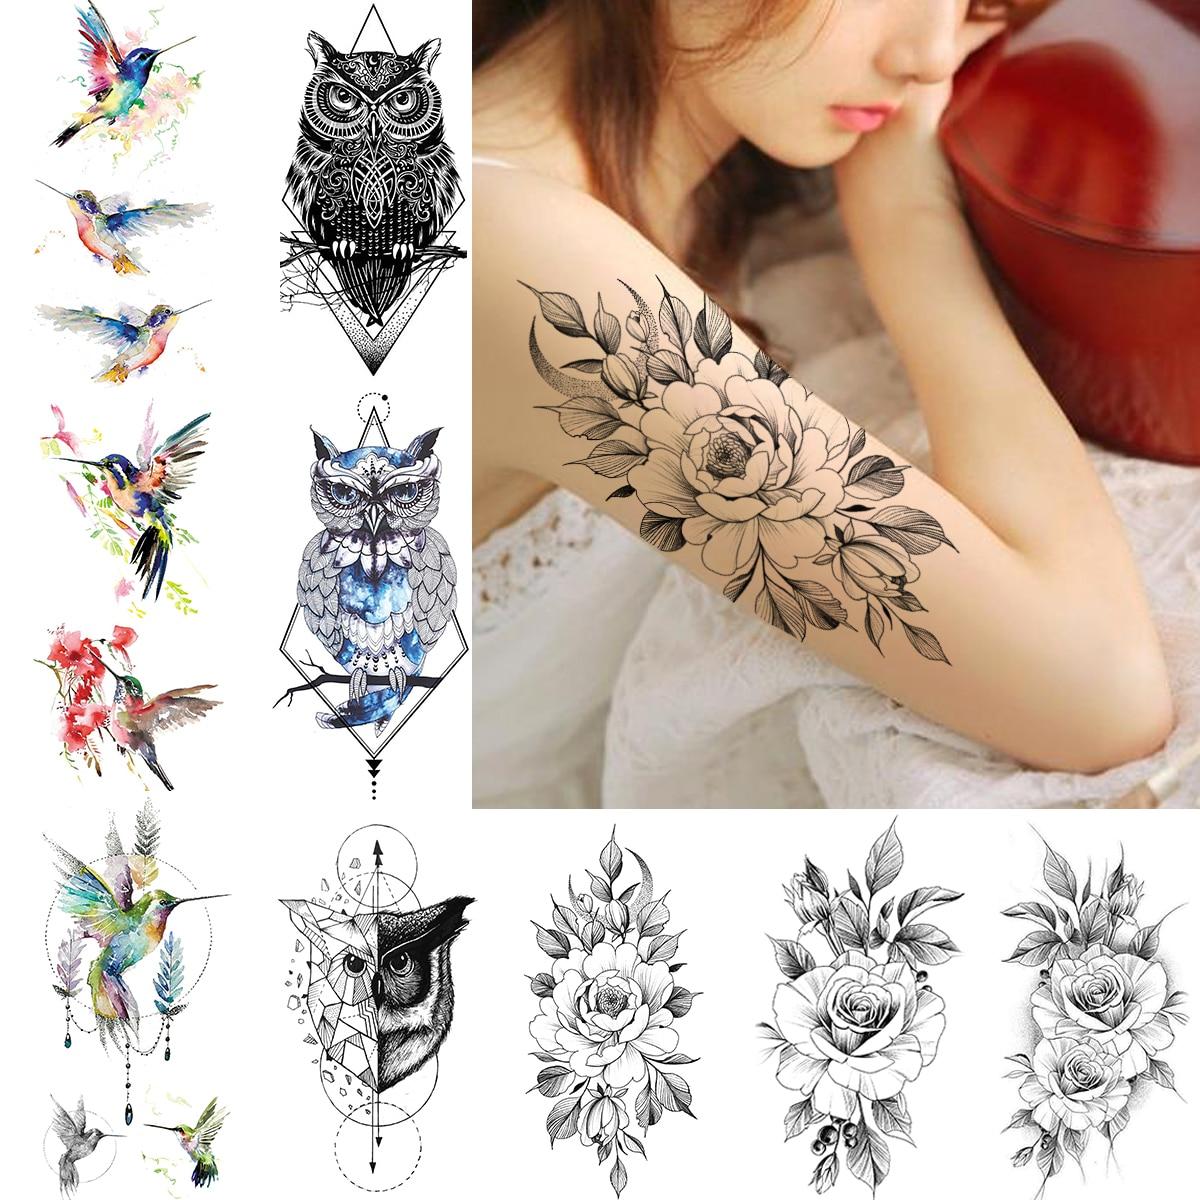 Diamond Rhombus Owl Temporary Tattoos For Women Crescent Moon Flower Arm Tatoos Body Art Fake Flash Hummingbird Tattoo Stickers